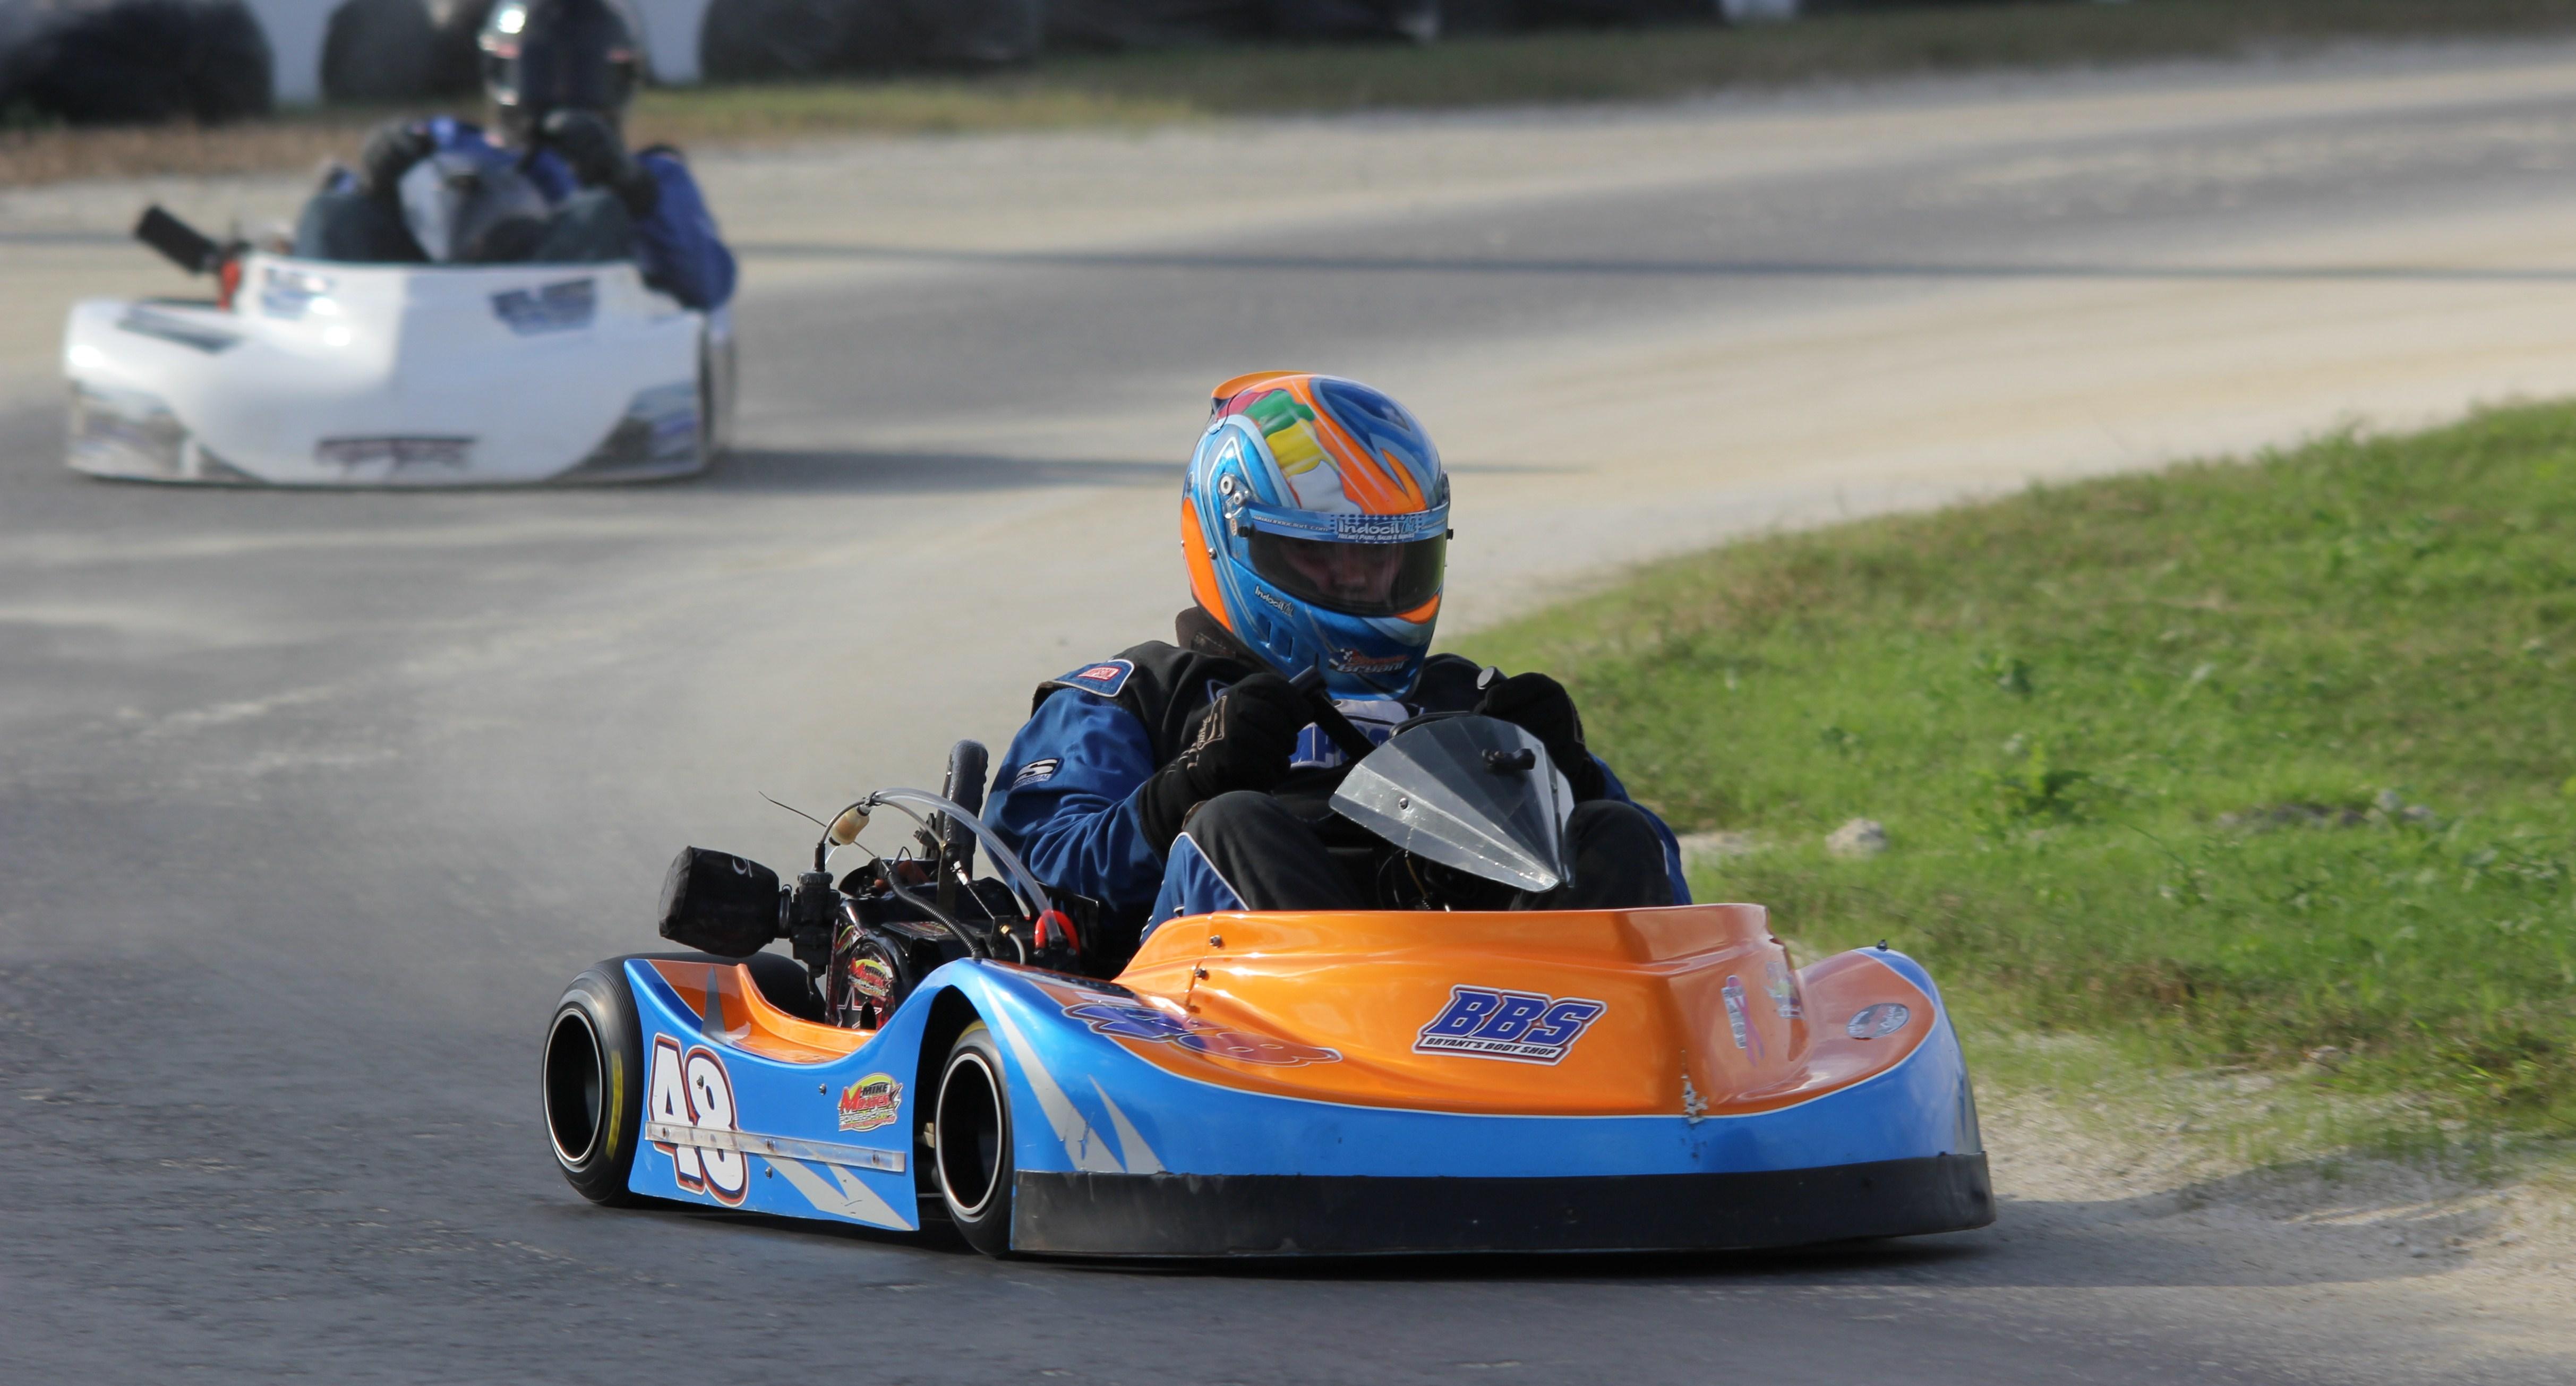 Daytona Kart Racing Images